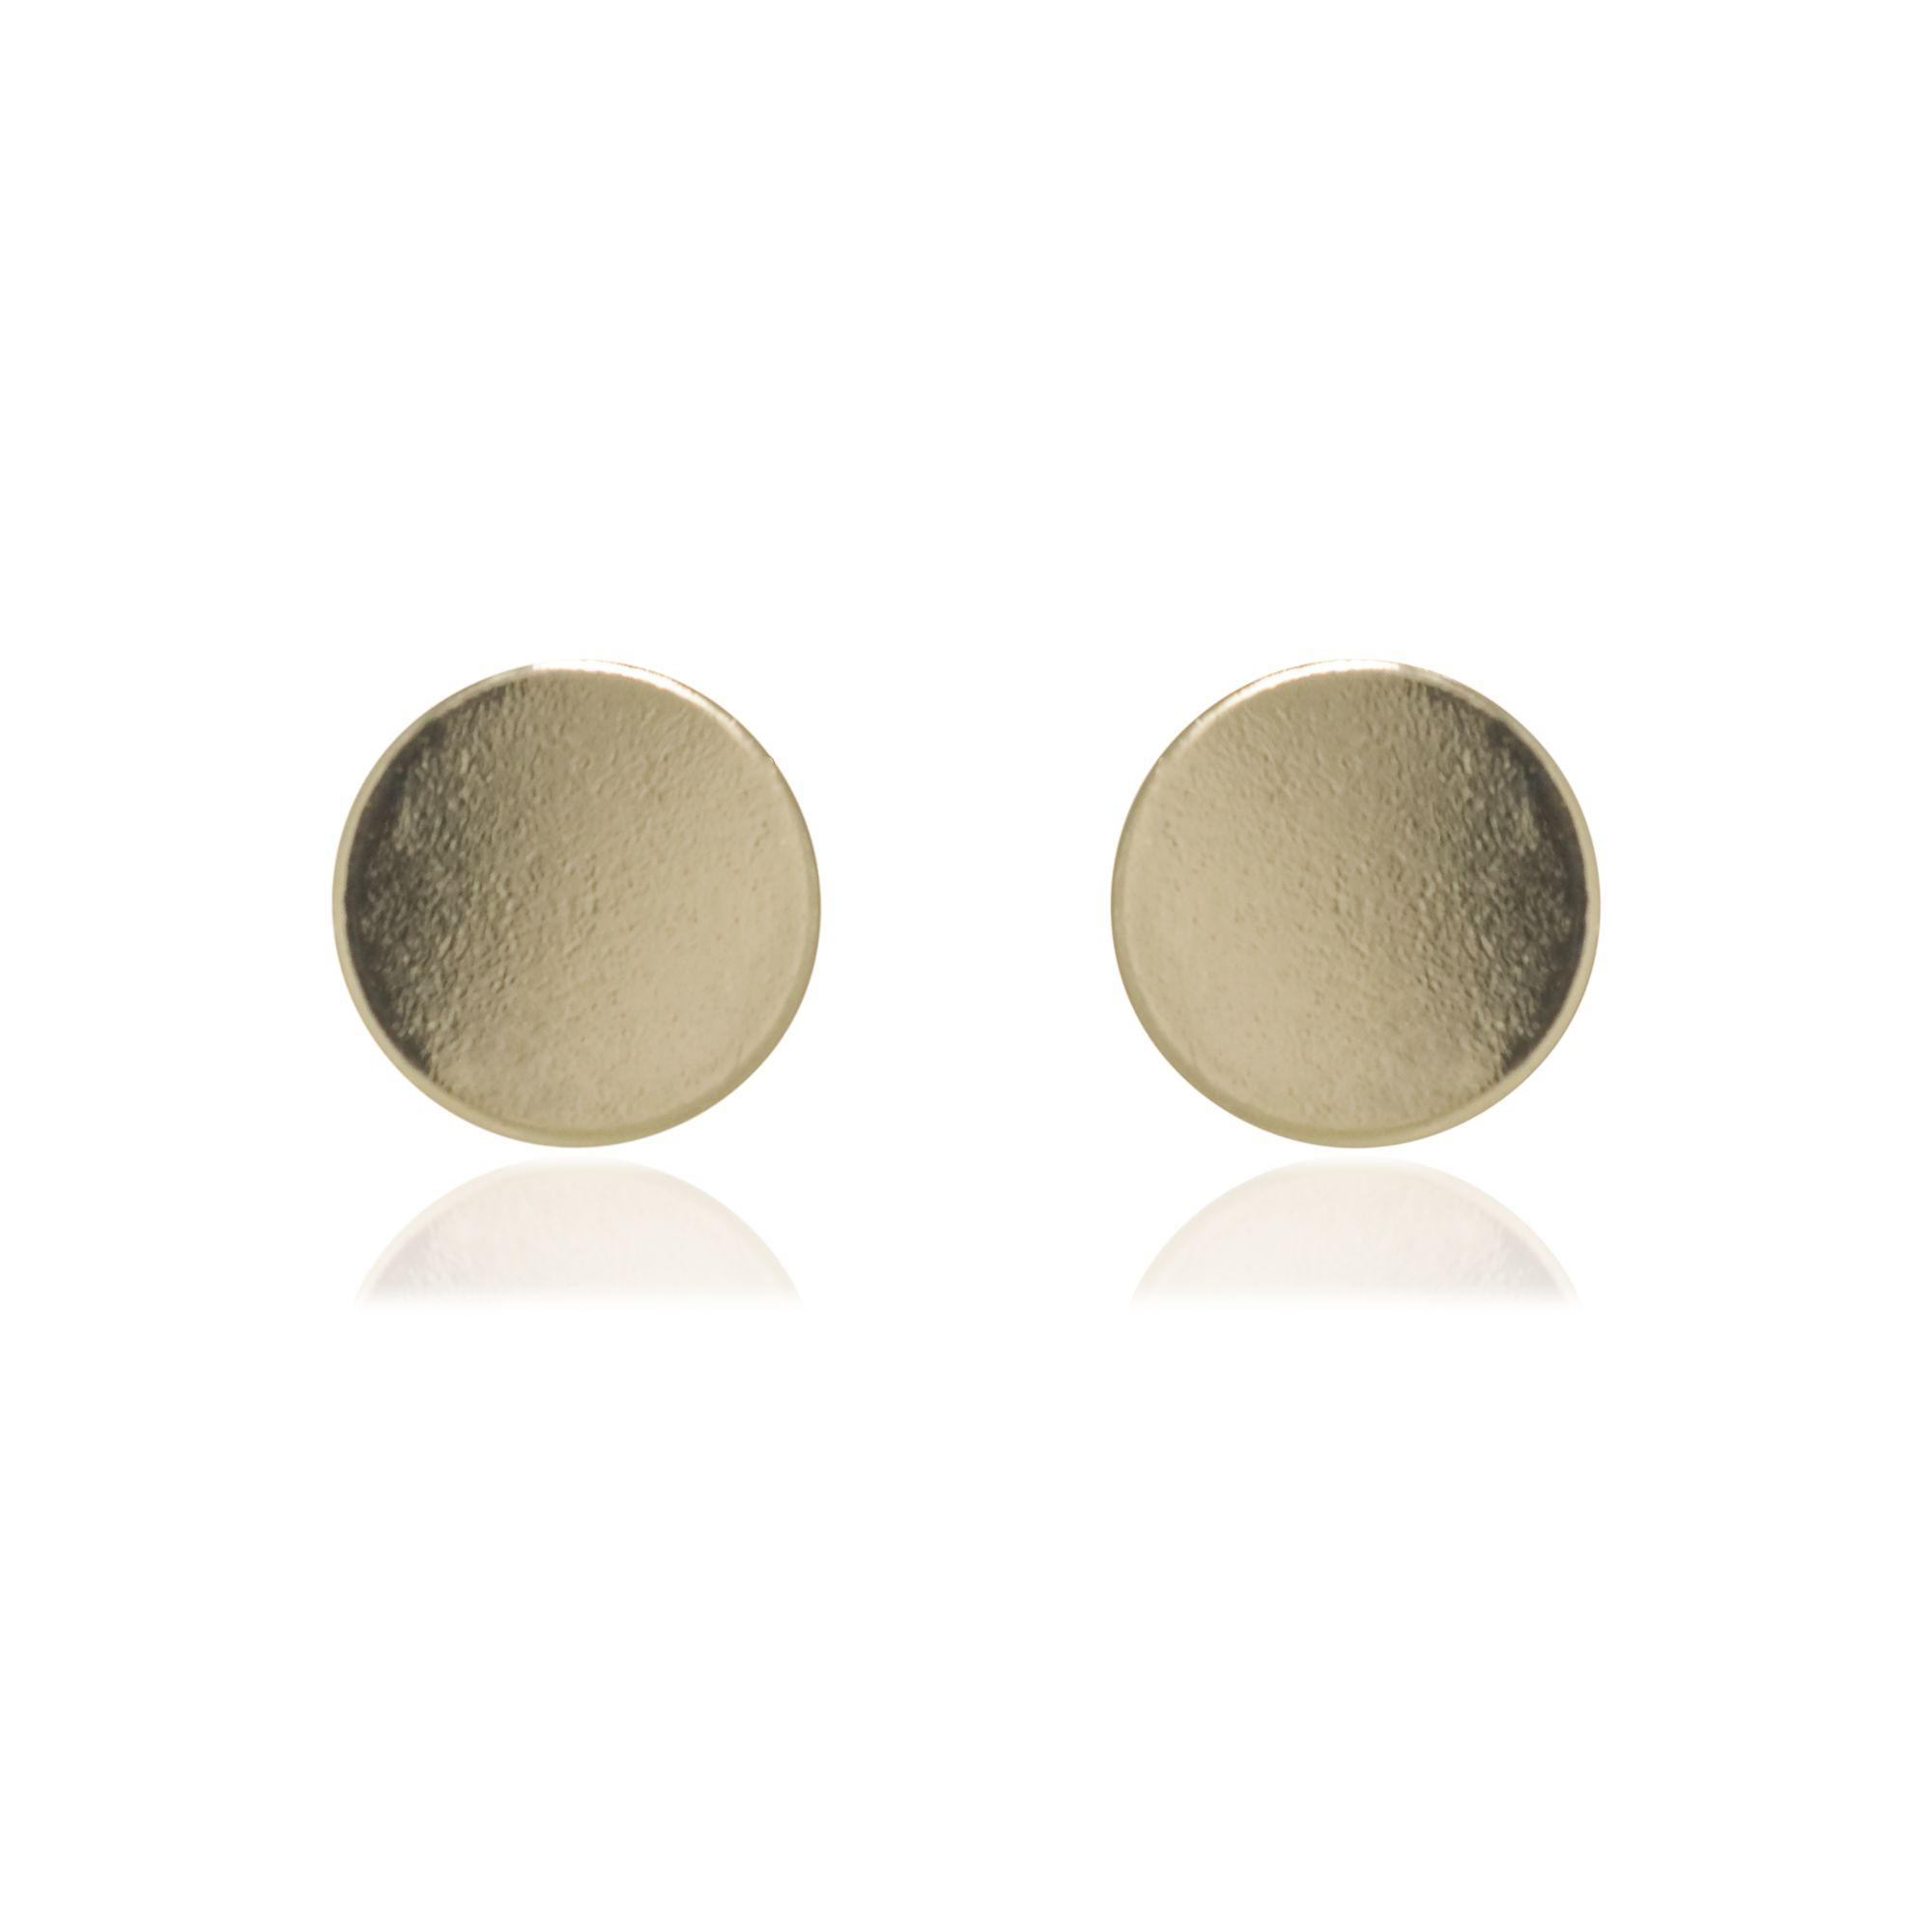 Brinco Semi joia redondo mini estilo minimalista banhado a ouro18k ou rhodium